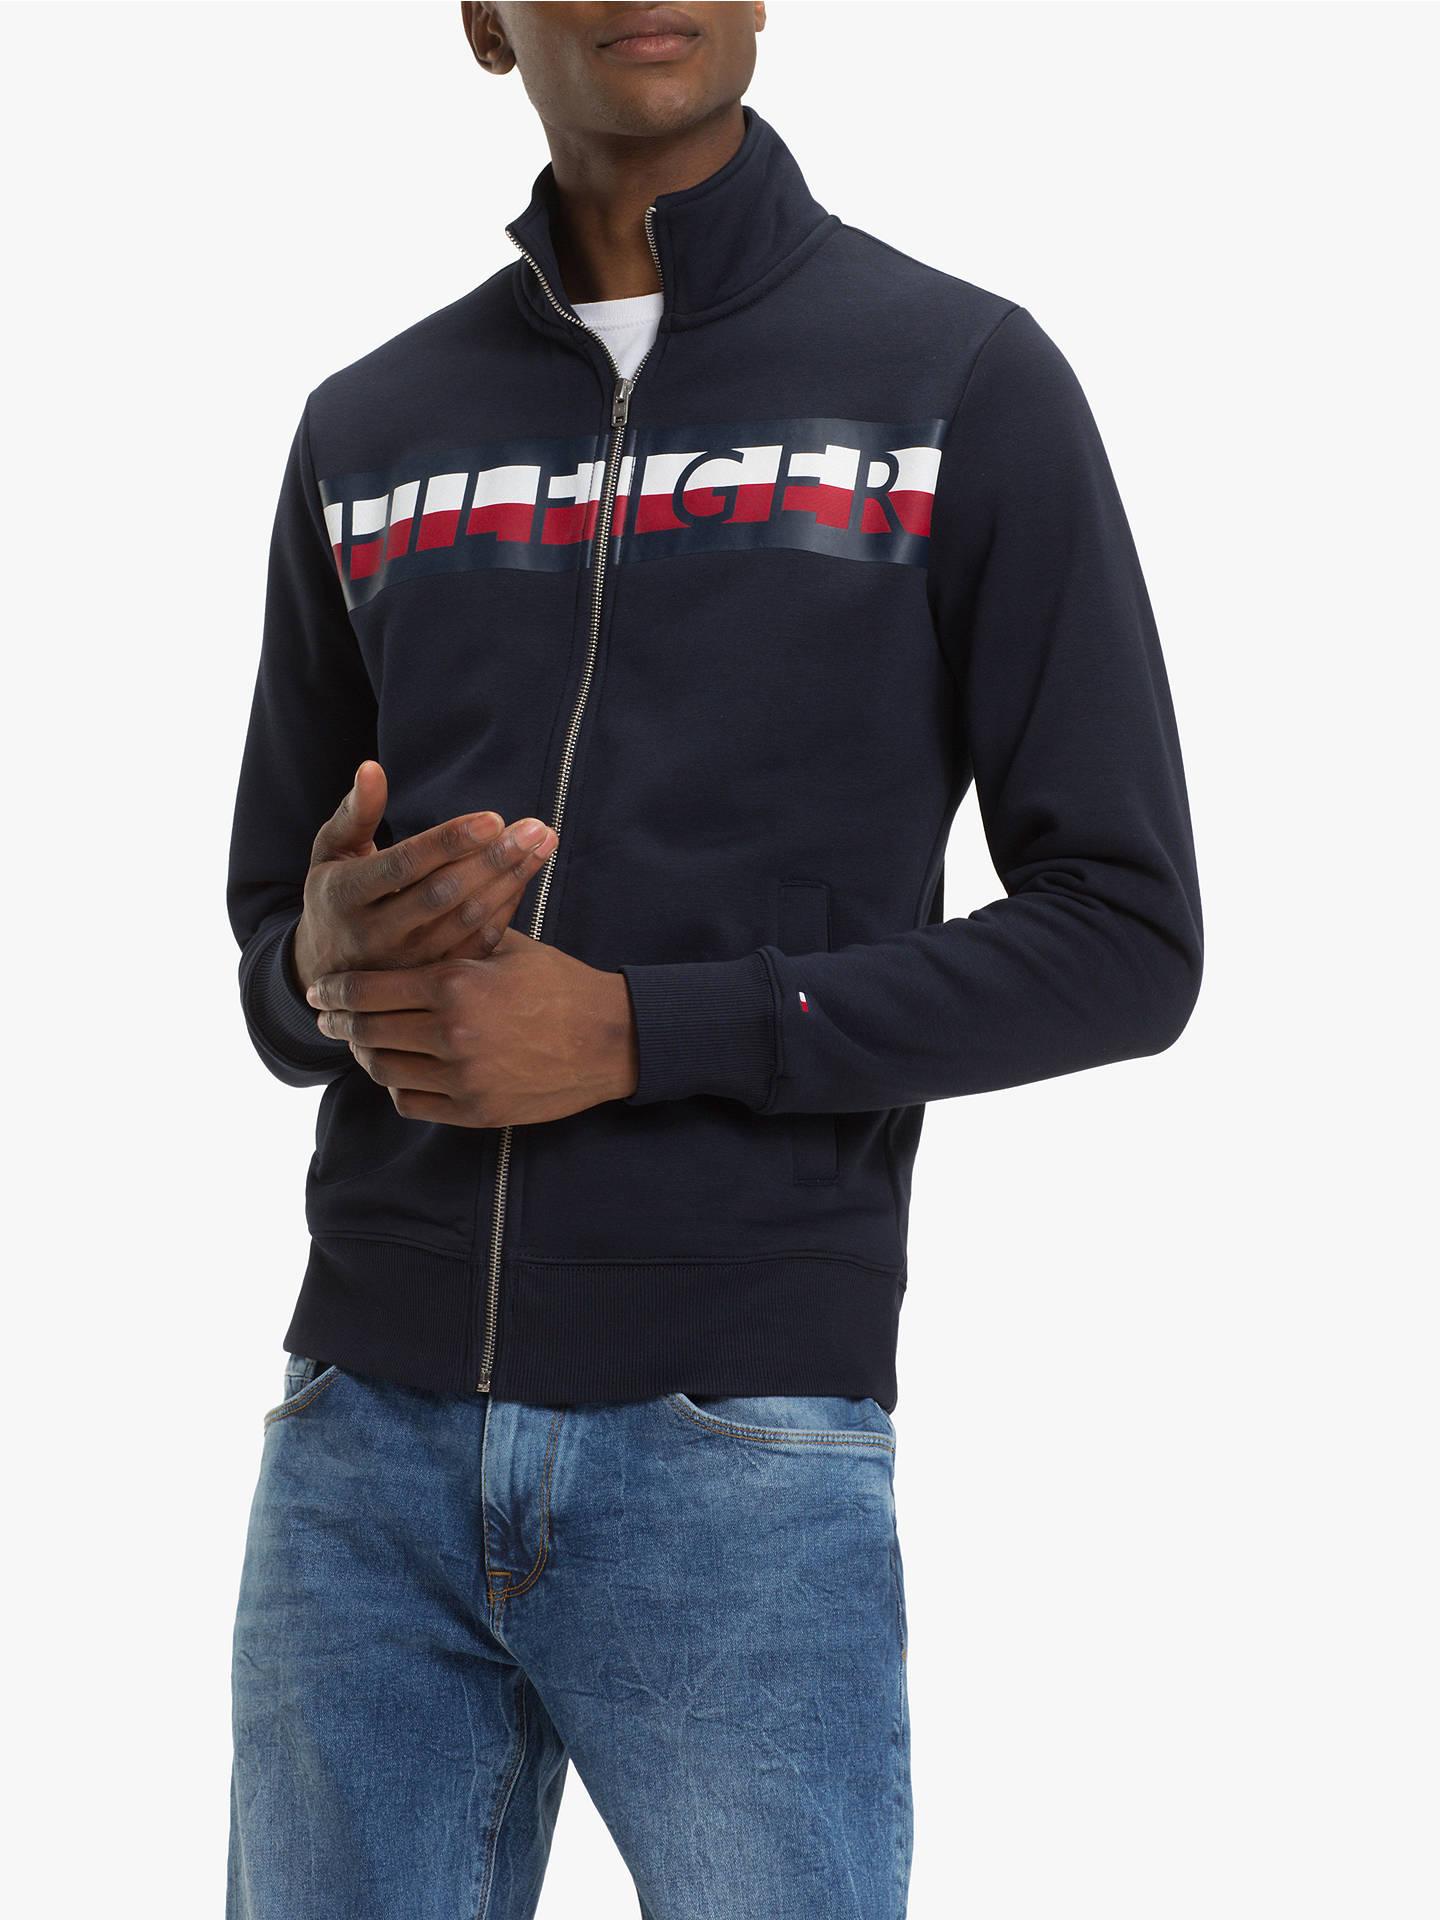 7a8056ea Buy Tommy Hilfiger Zip Through Sweatshirt, Sky Captain, XL Online at  johnlewis.com ...